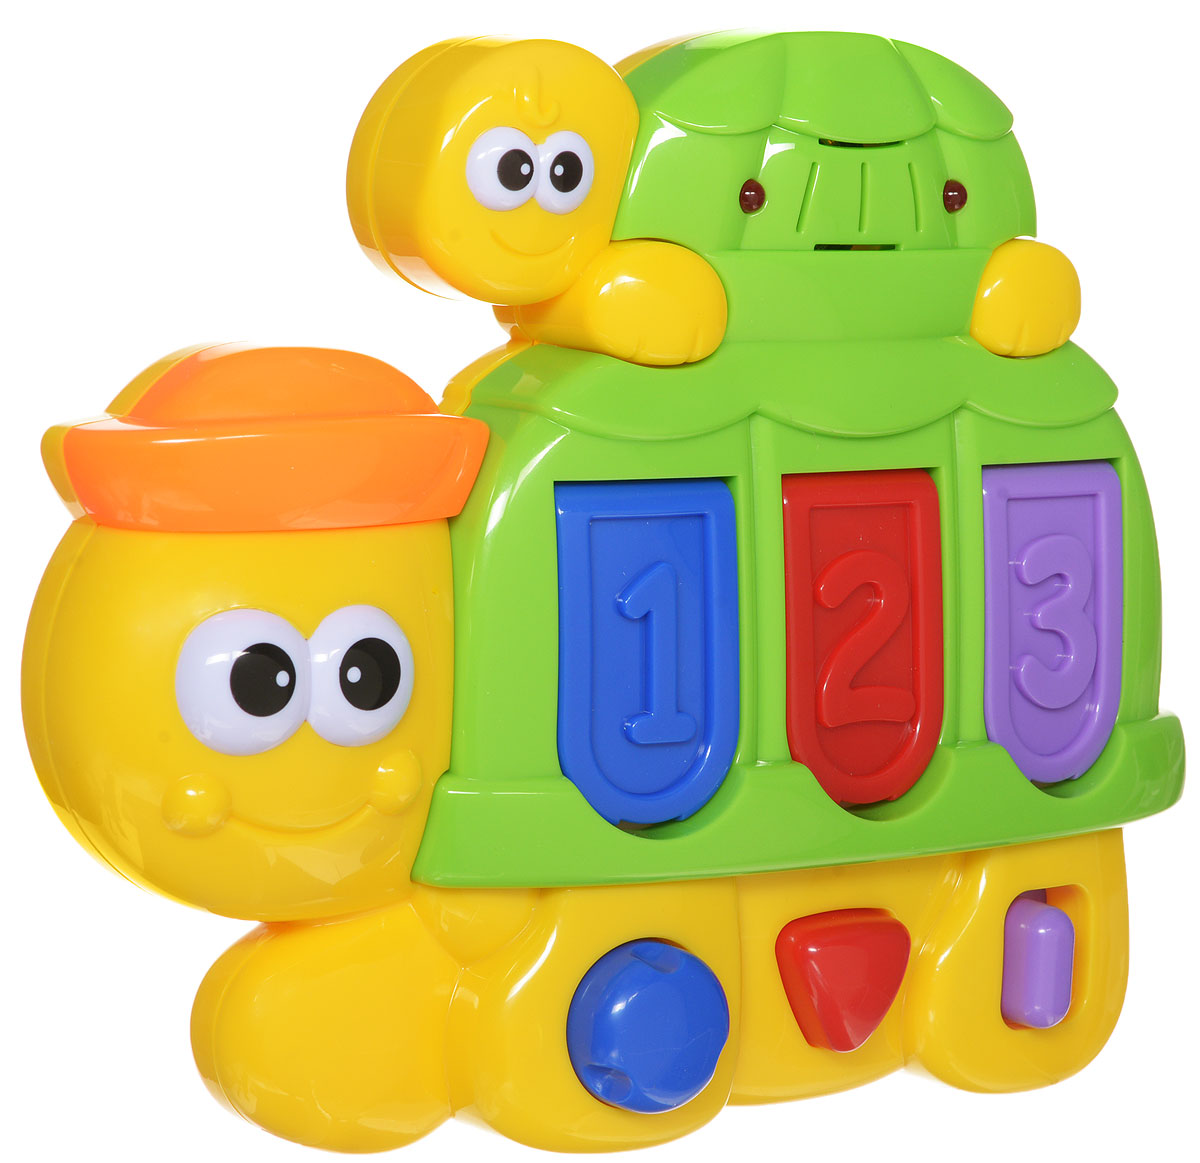 Navystar Развивающая игрушка Черепашка игрушка черепашка b kids